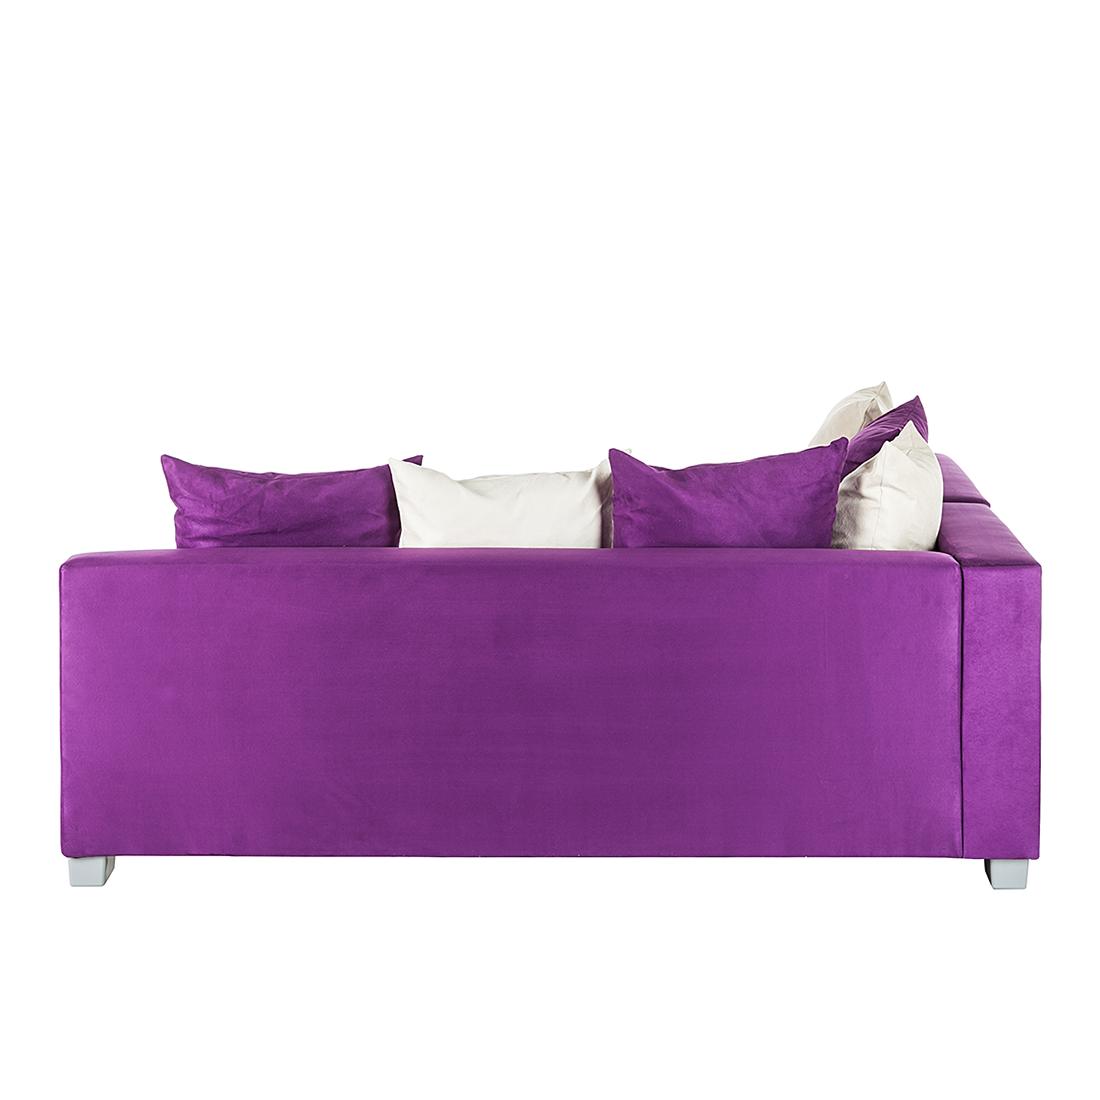 neu ecksofa mit hocker stoff lila wei recamiere rechts eckcouch sofa schlafsofa. Black Bedroom Furniture Sets. Home Design Ideas